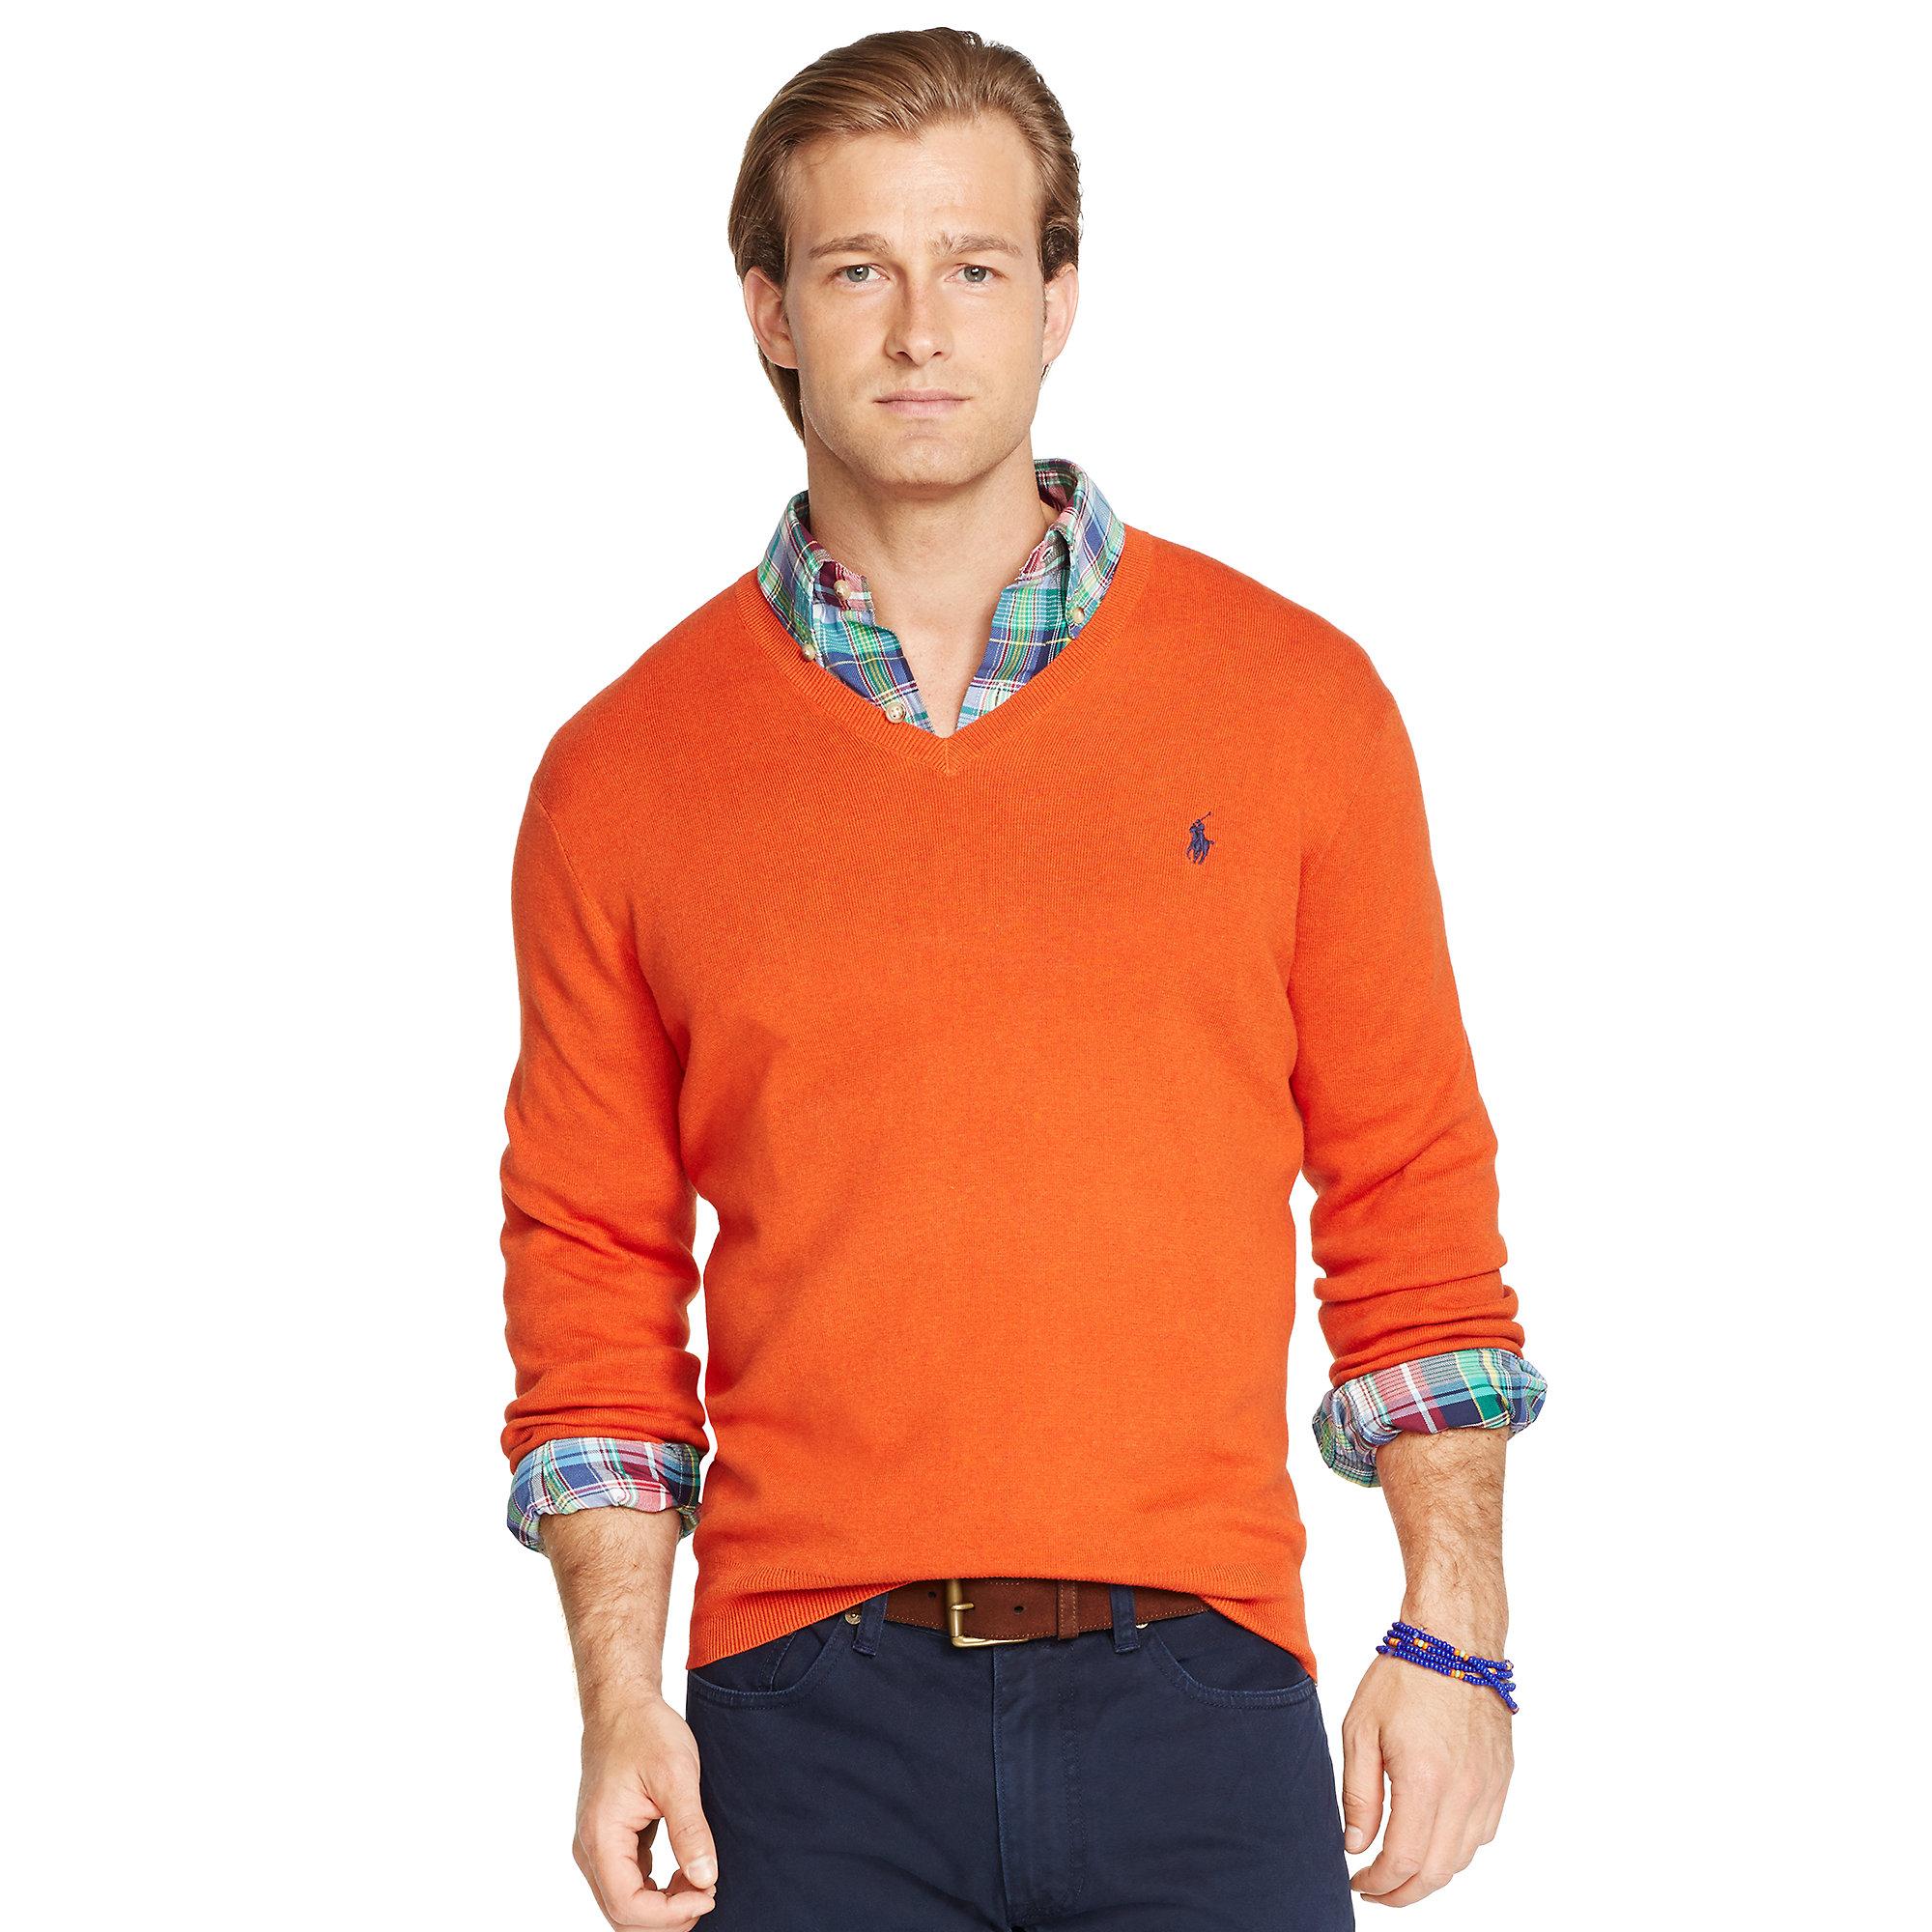 e75d4005e920 Lyst - Polo Ralph Lauren Pima Cotton V-neck Sweater in Orange for Men